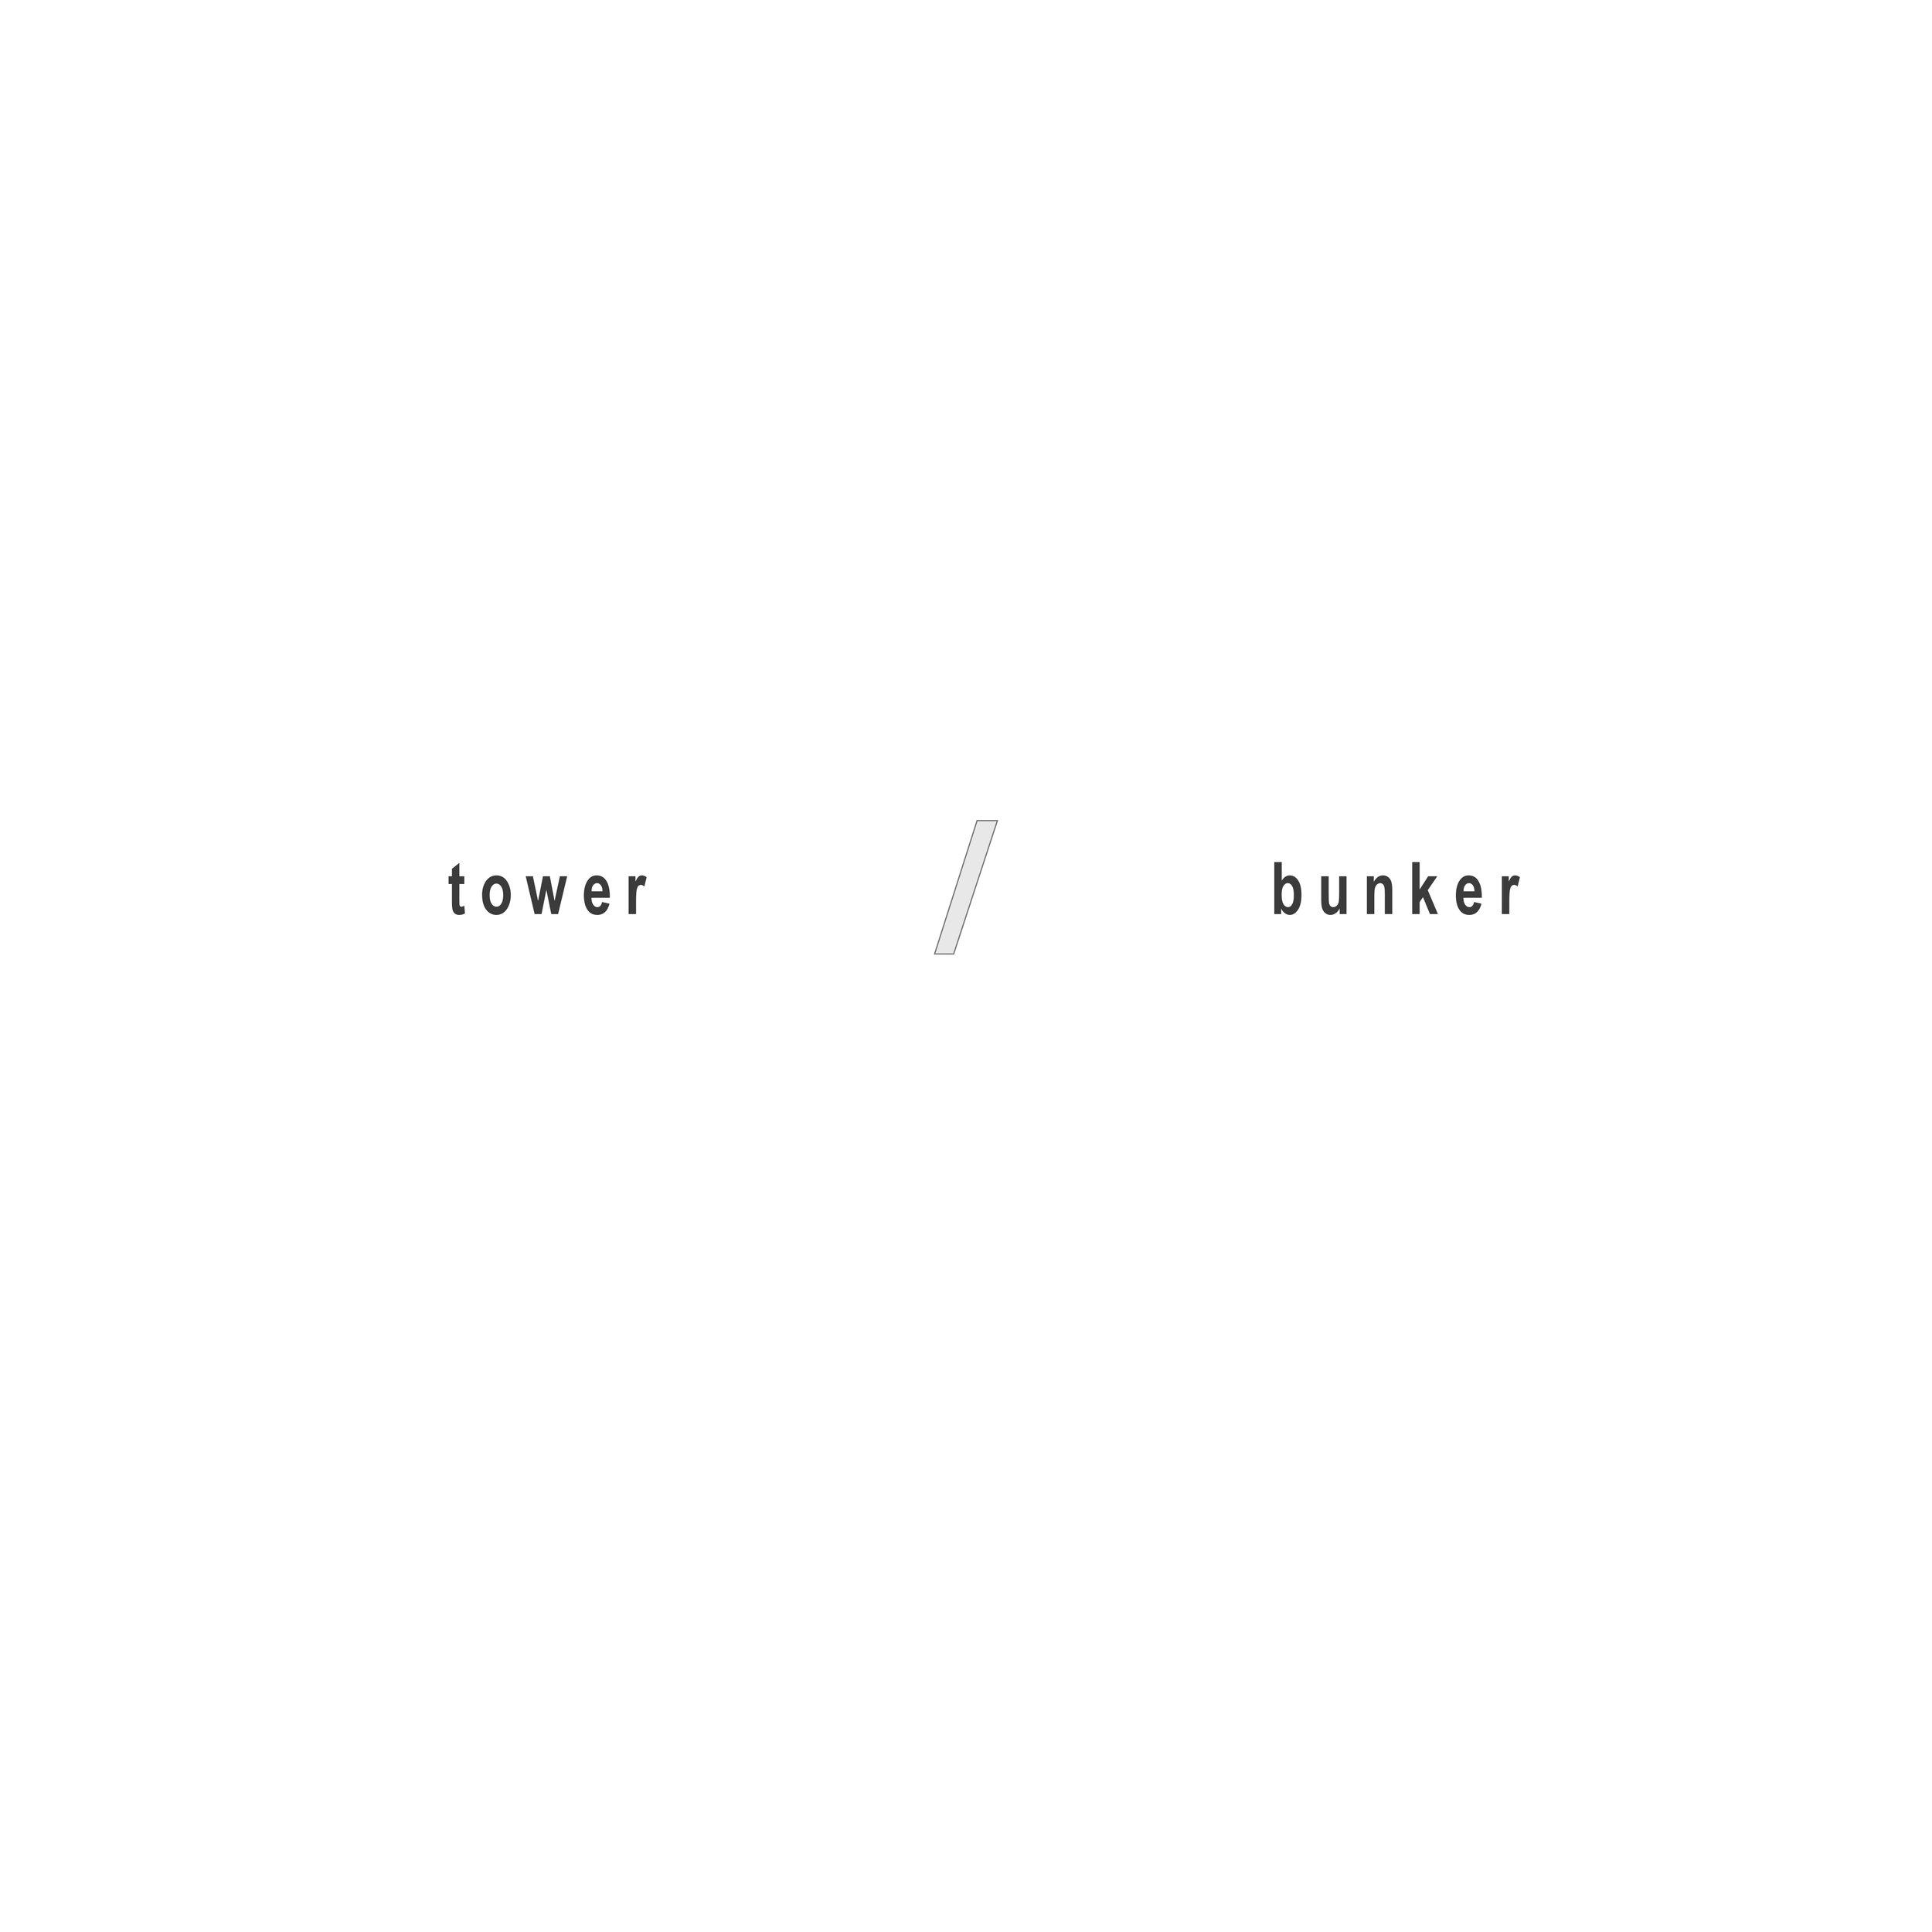 Christopher Beer Architect-Tower-Bunker-Title.jpg